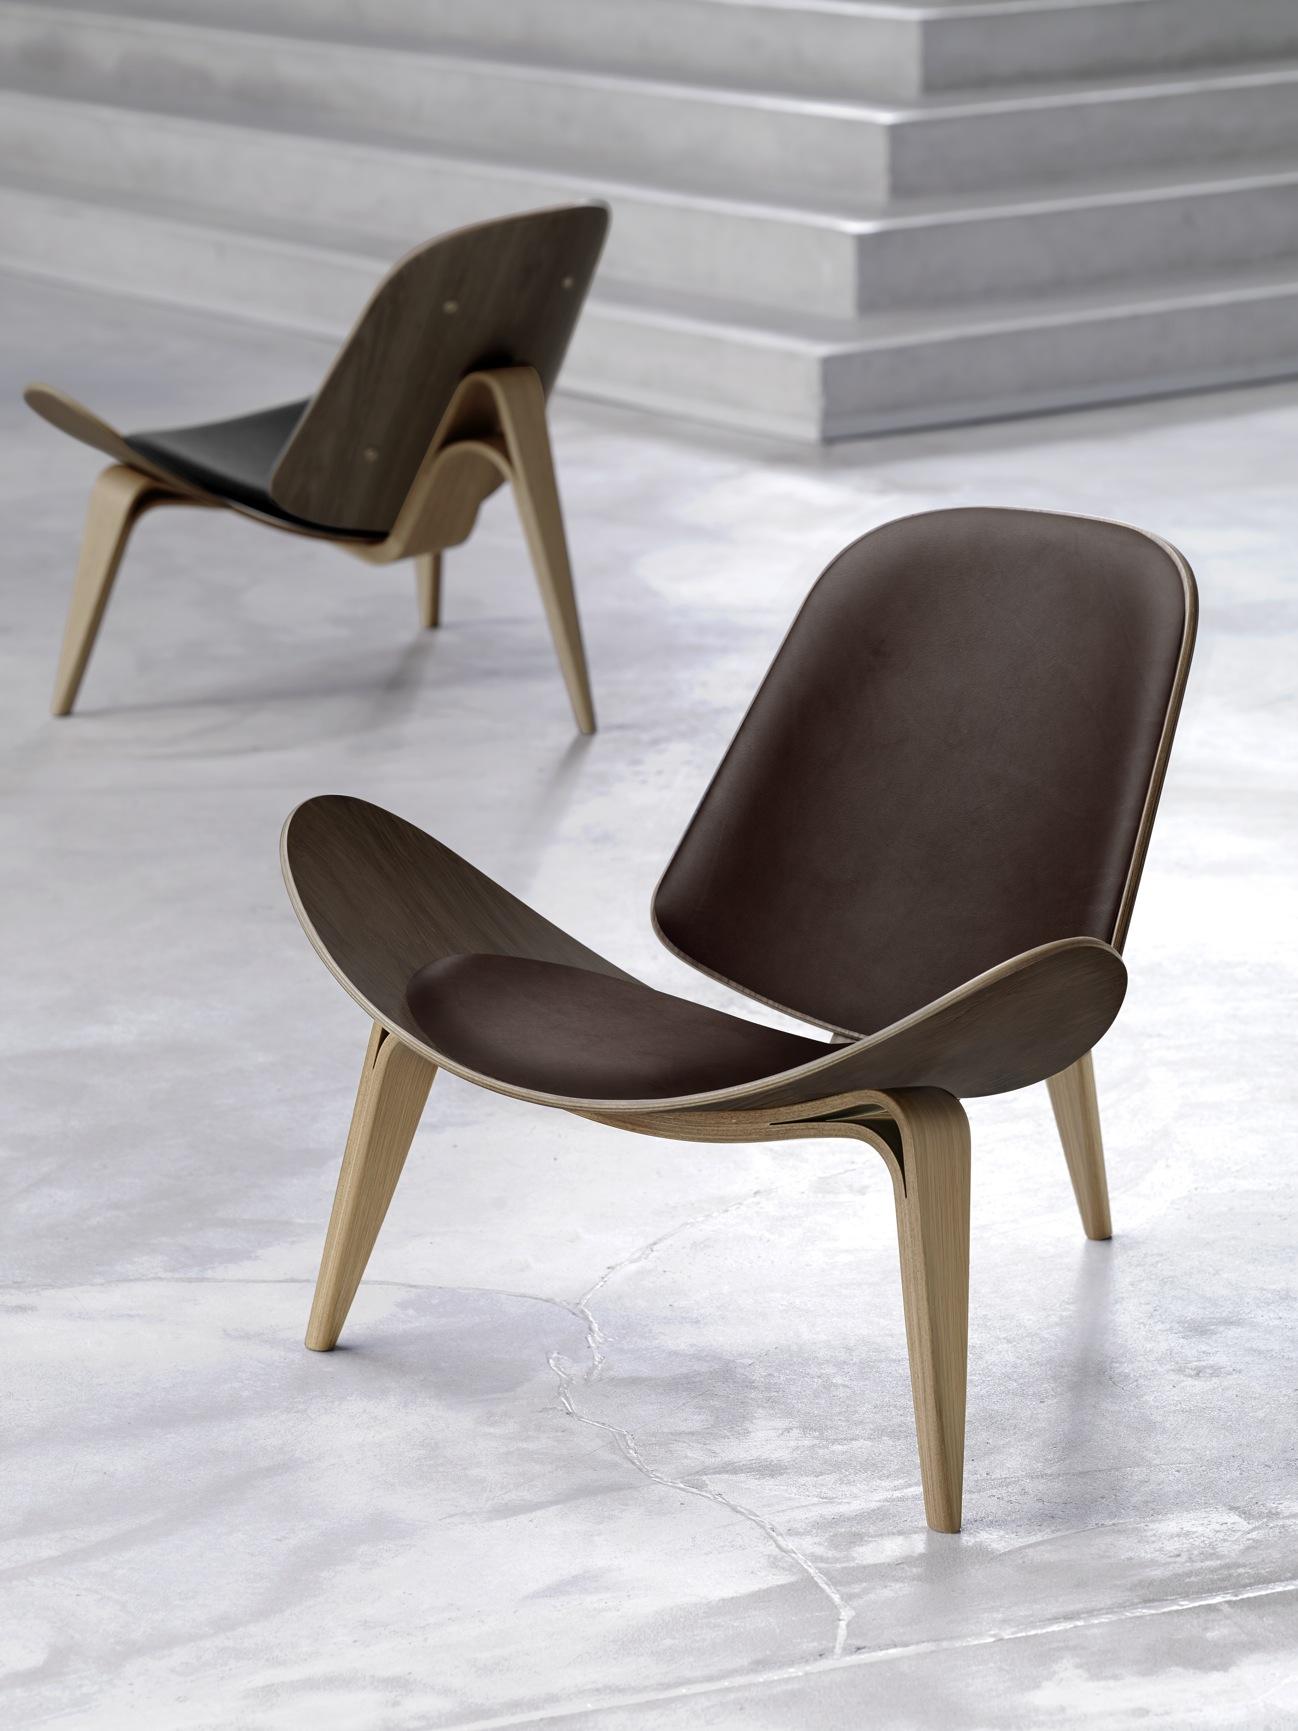 CH07 Shell Chair – Carl Hansen & S¸n Hans Wegner